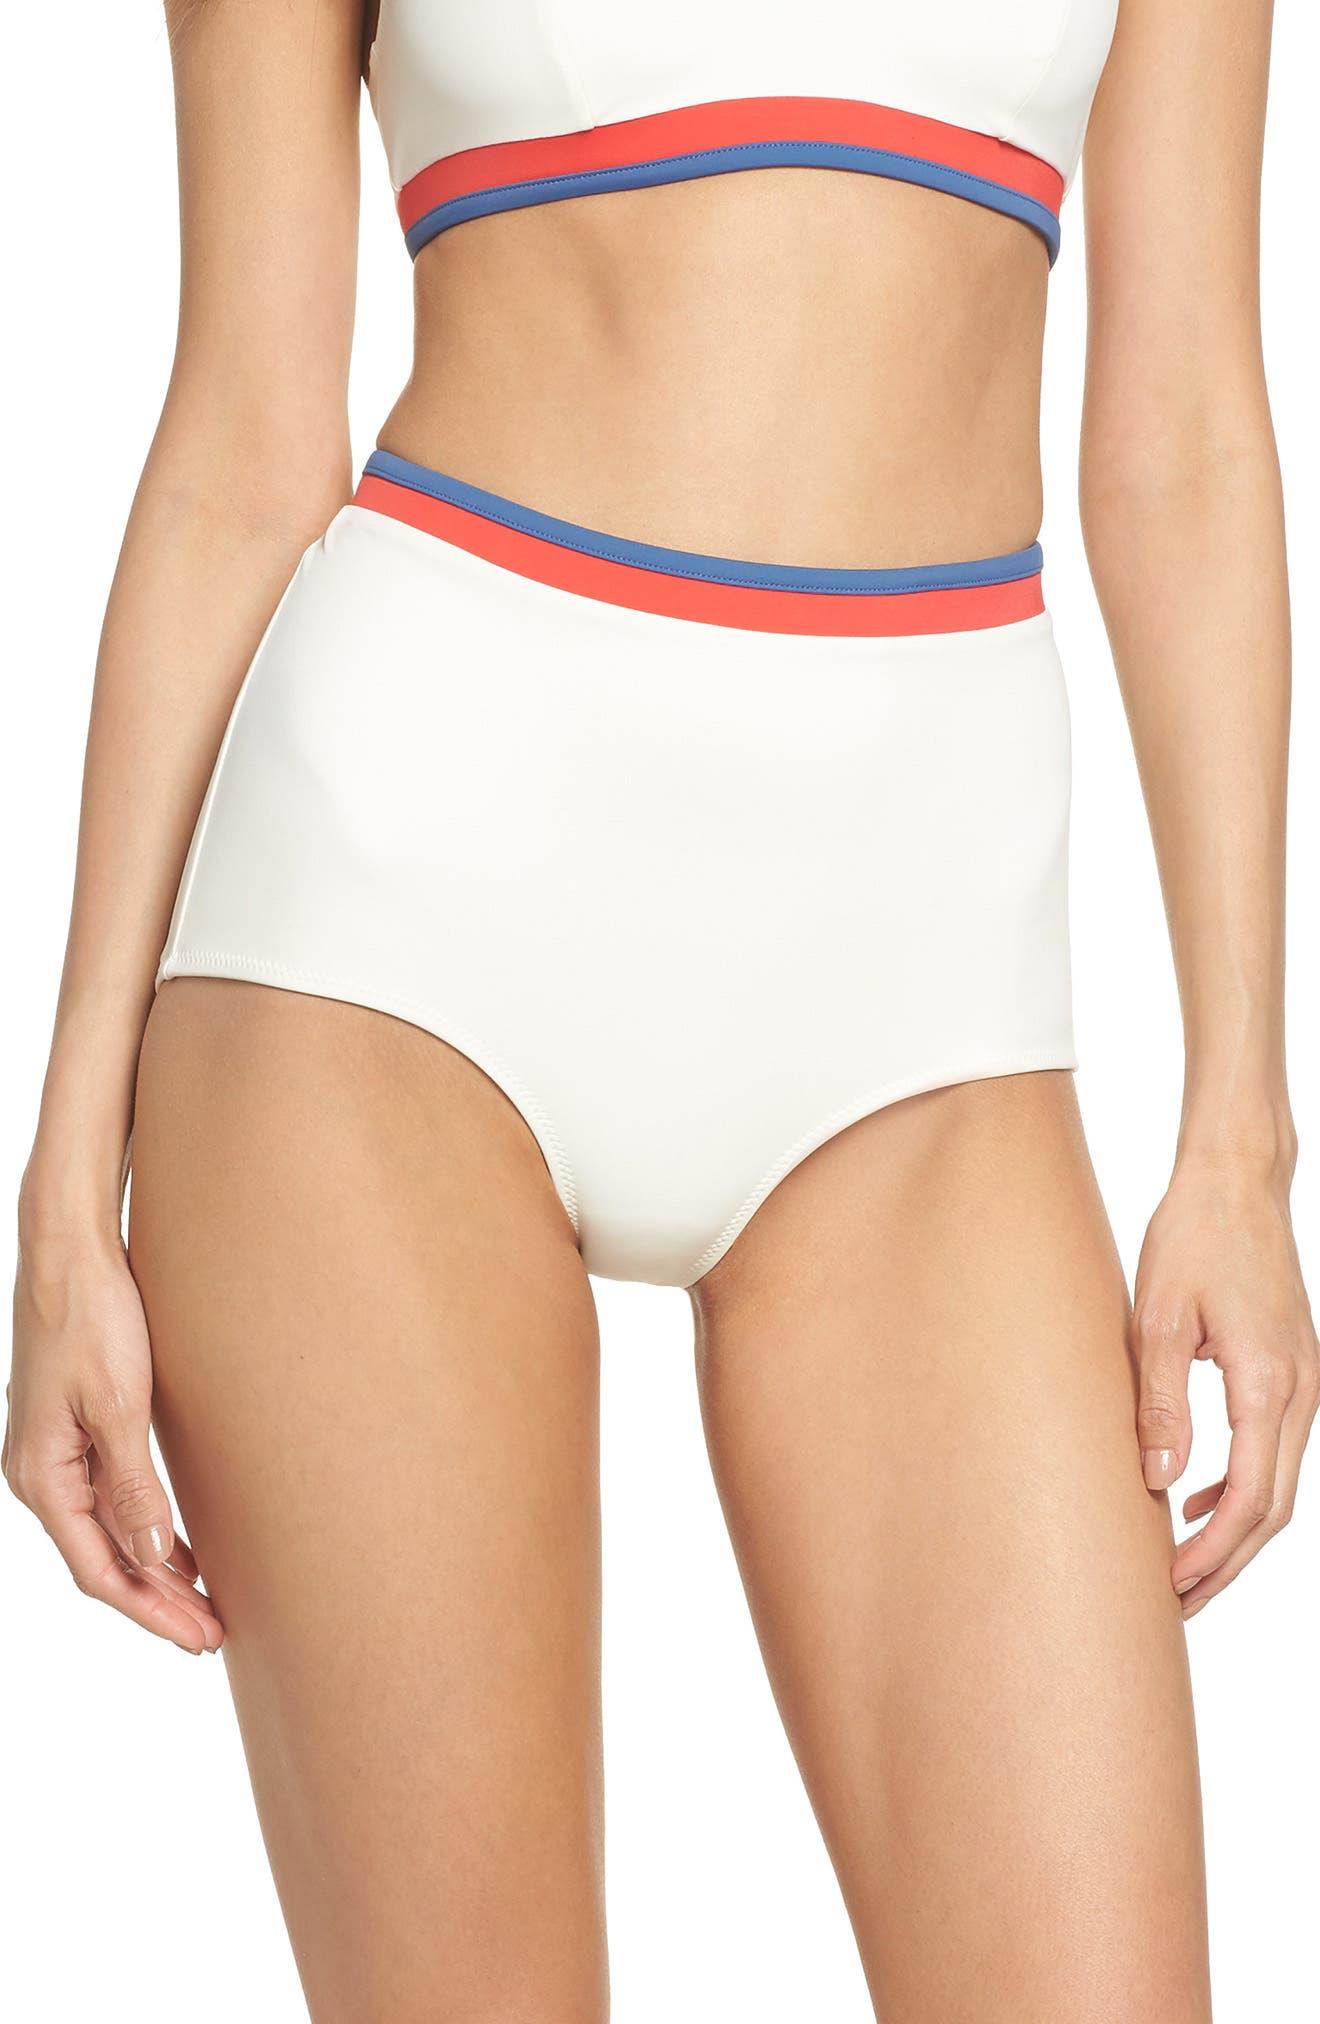 Solid & Stripe Katie High Waist Bikini Bottoms,                             Main thumbnail 1, color,                             900